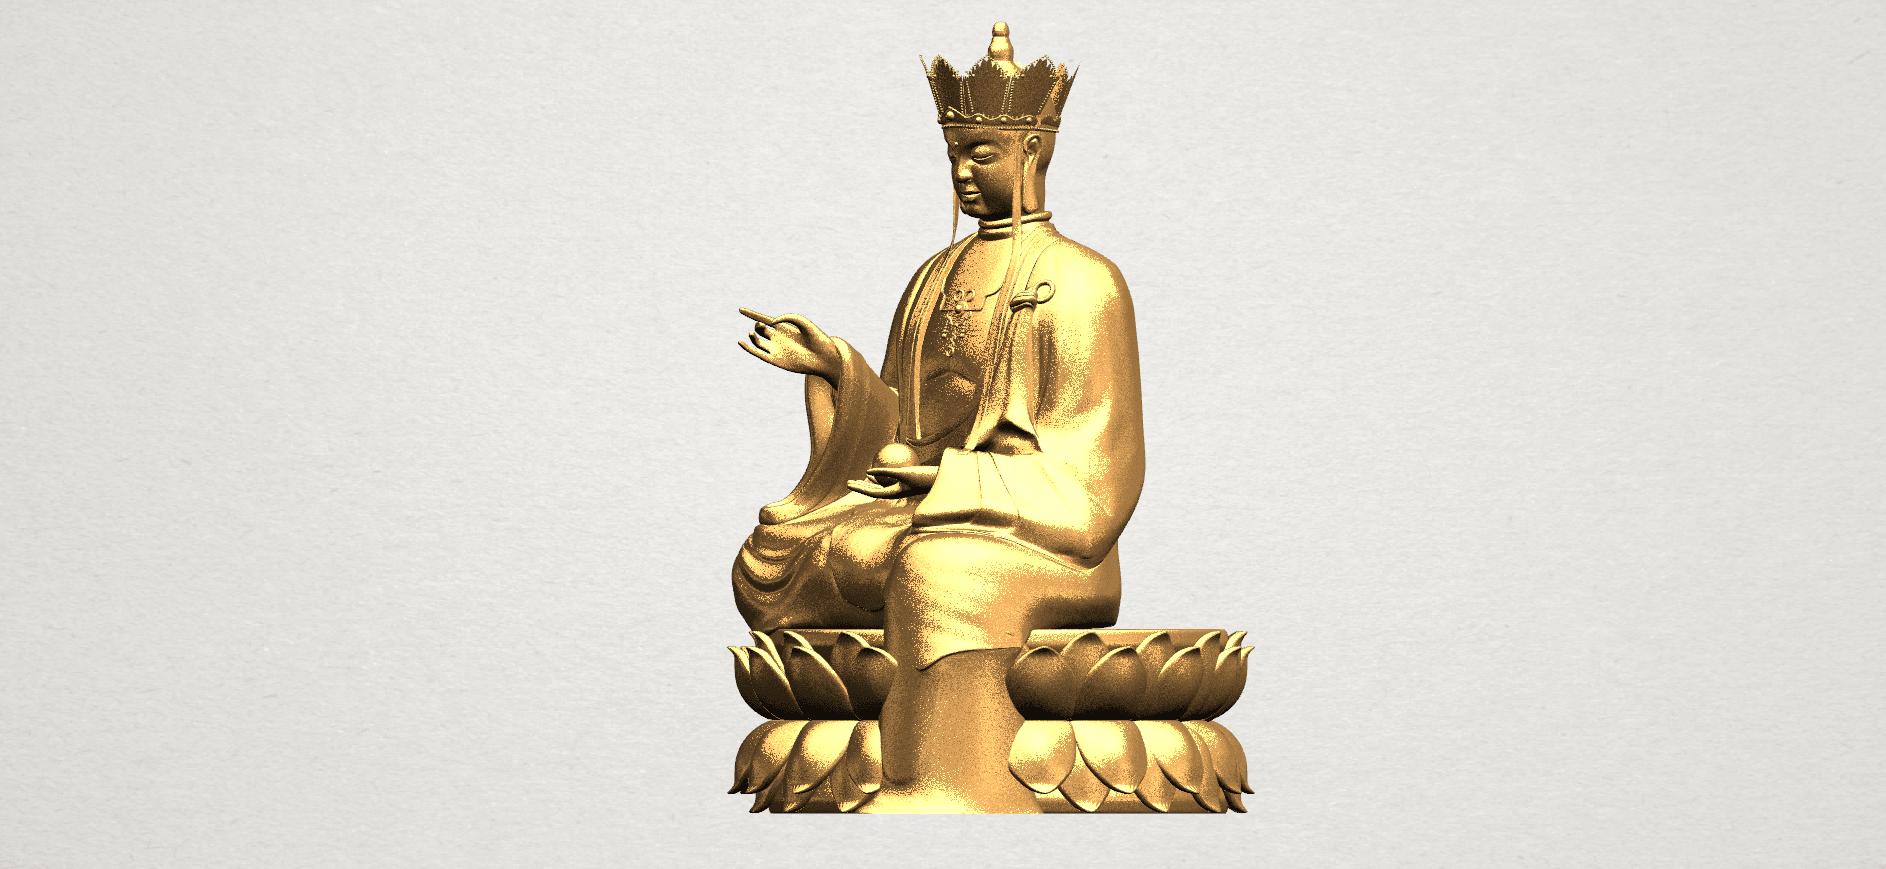 Tang Monk Xuan Zang A02.png Télécharger fichier STL gratuit Tang Monk Xuan Zang Zang • Plan à imprimer en 3D, GeorgesNikkei